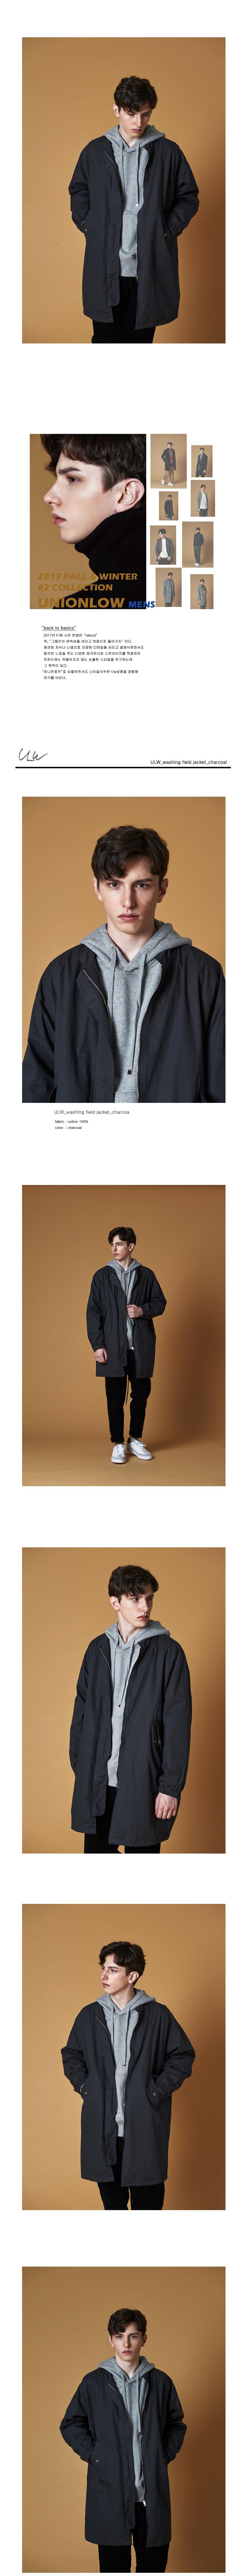 ulw-washing-field-jacket_charcoal.jpg